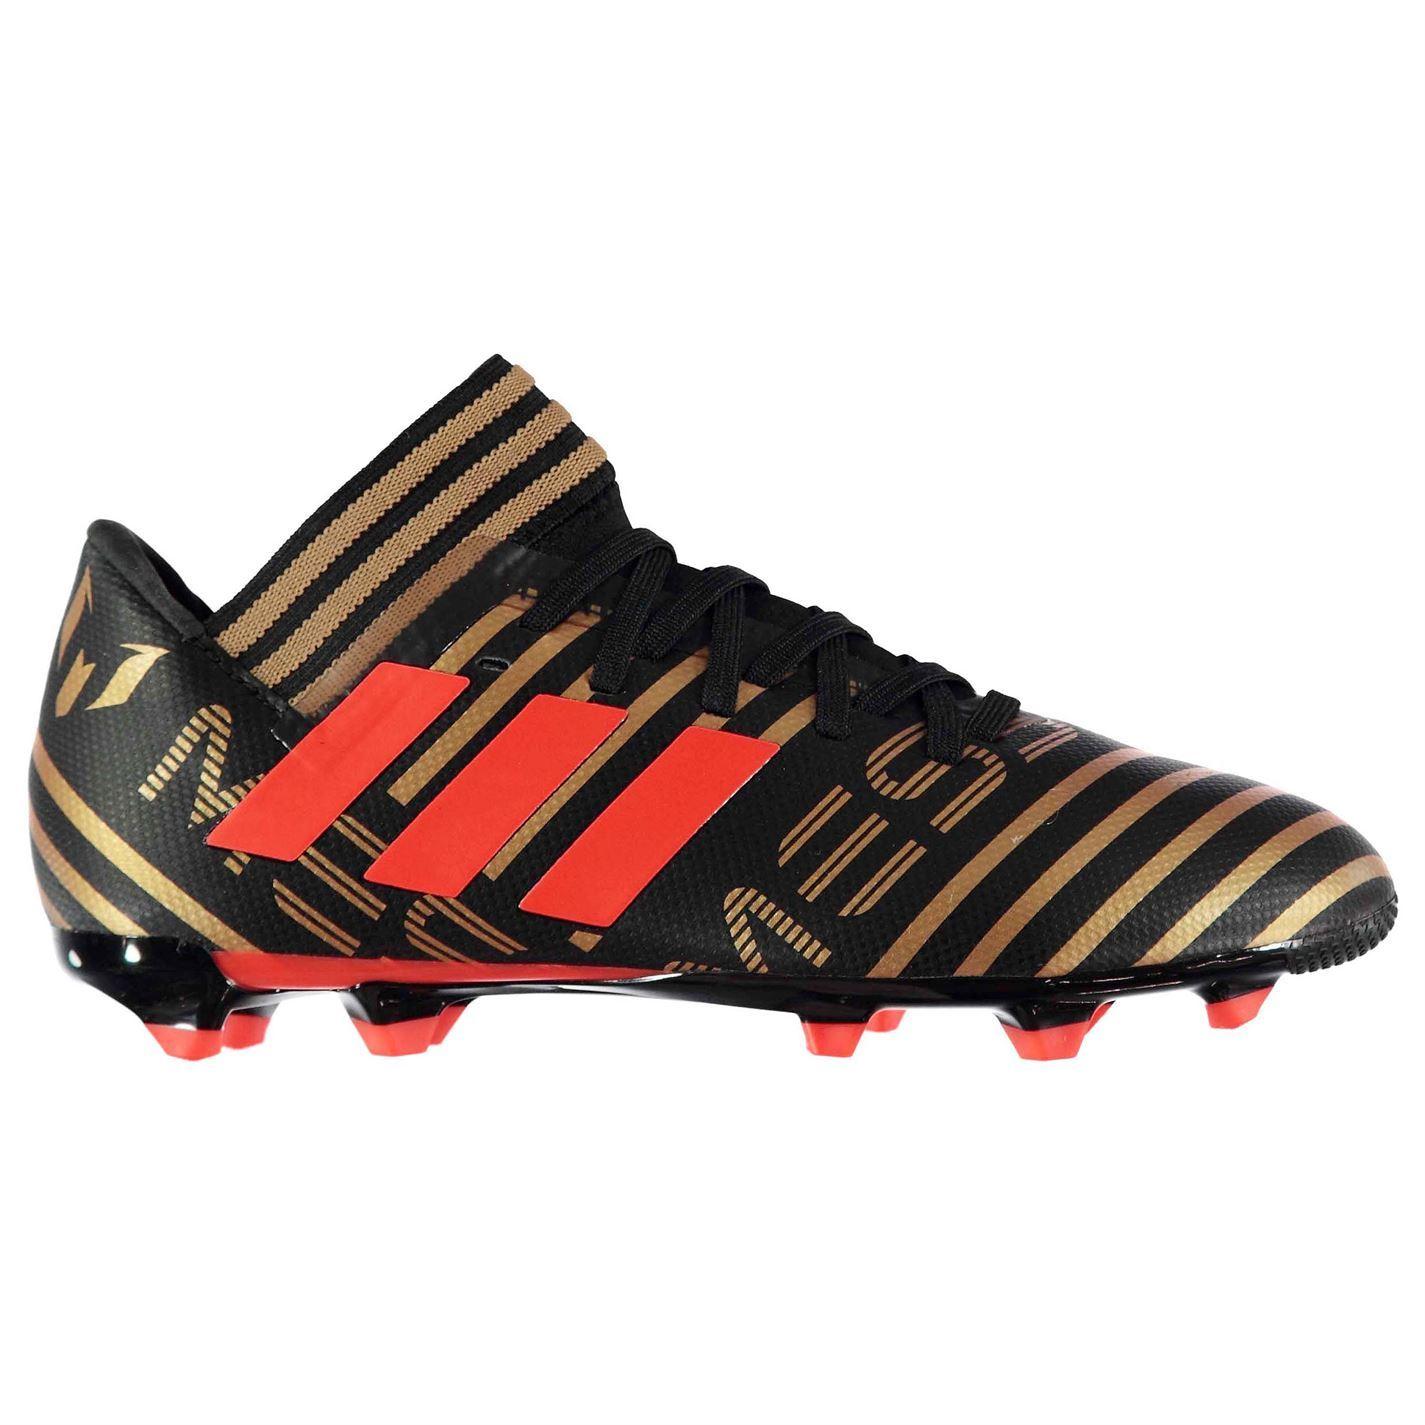 Adidas Nemeziz Messi Fg Calcio Terra Ferma Ragazzi Calcio Calcio Fg Boot b41652